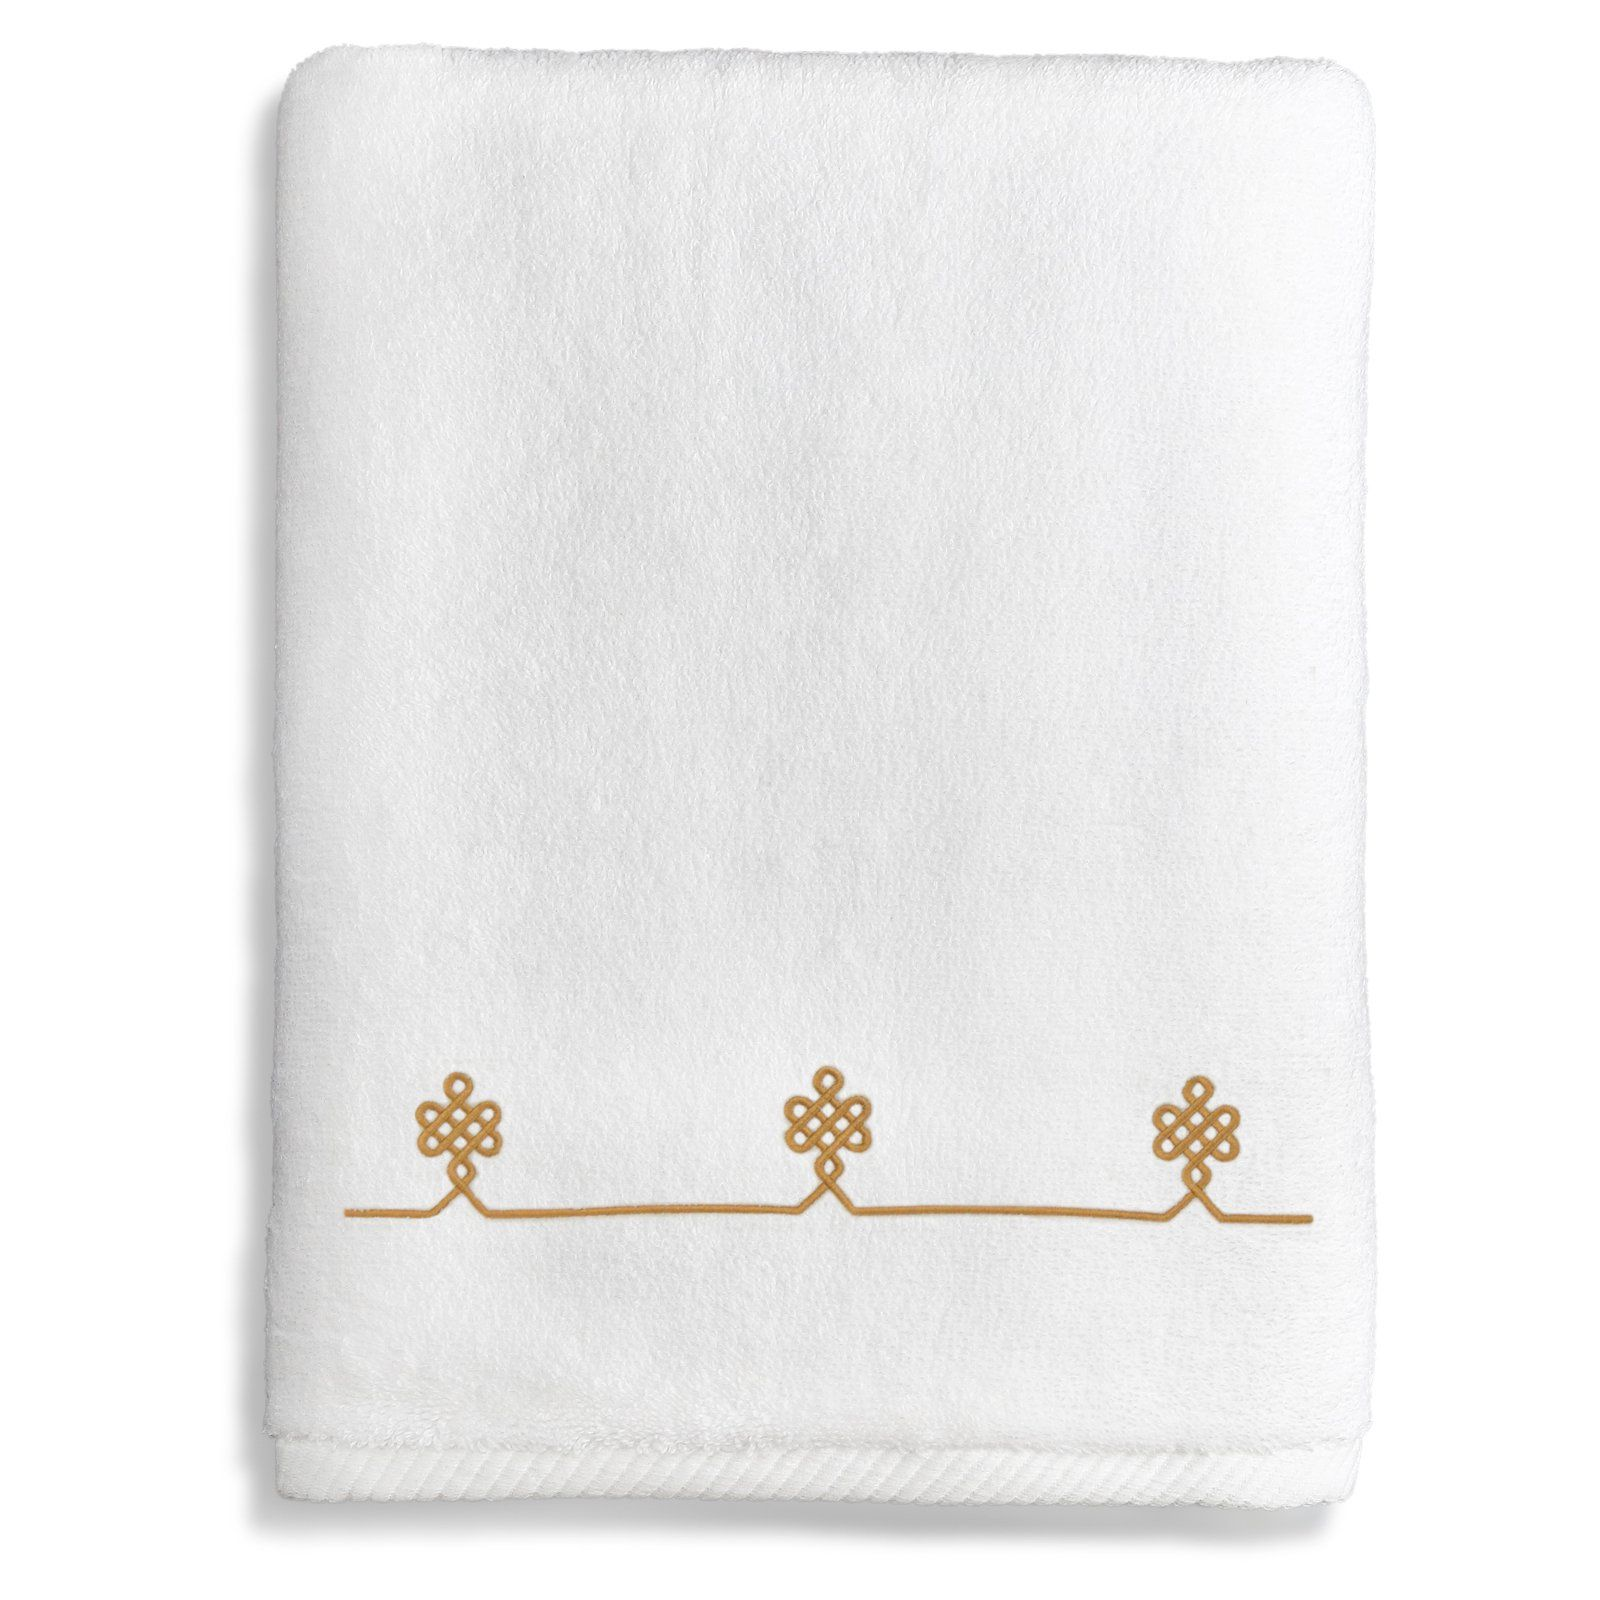 Linum Home Lattice Bath Towel - ST00-1BT-DIA-10